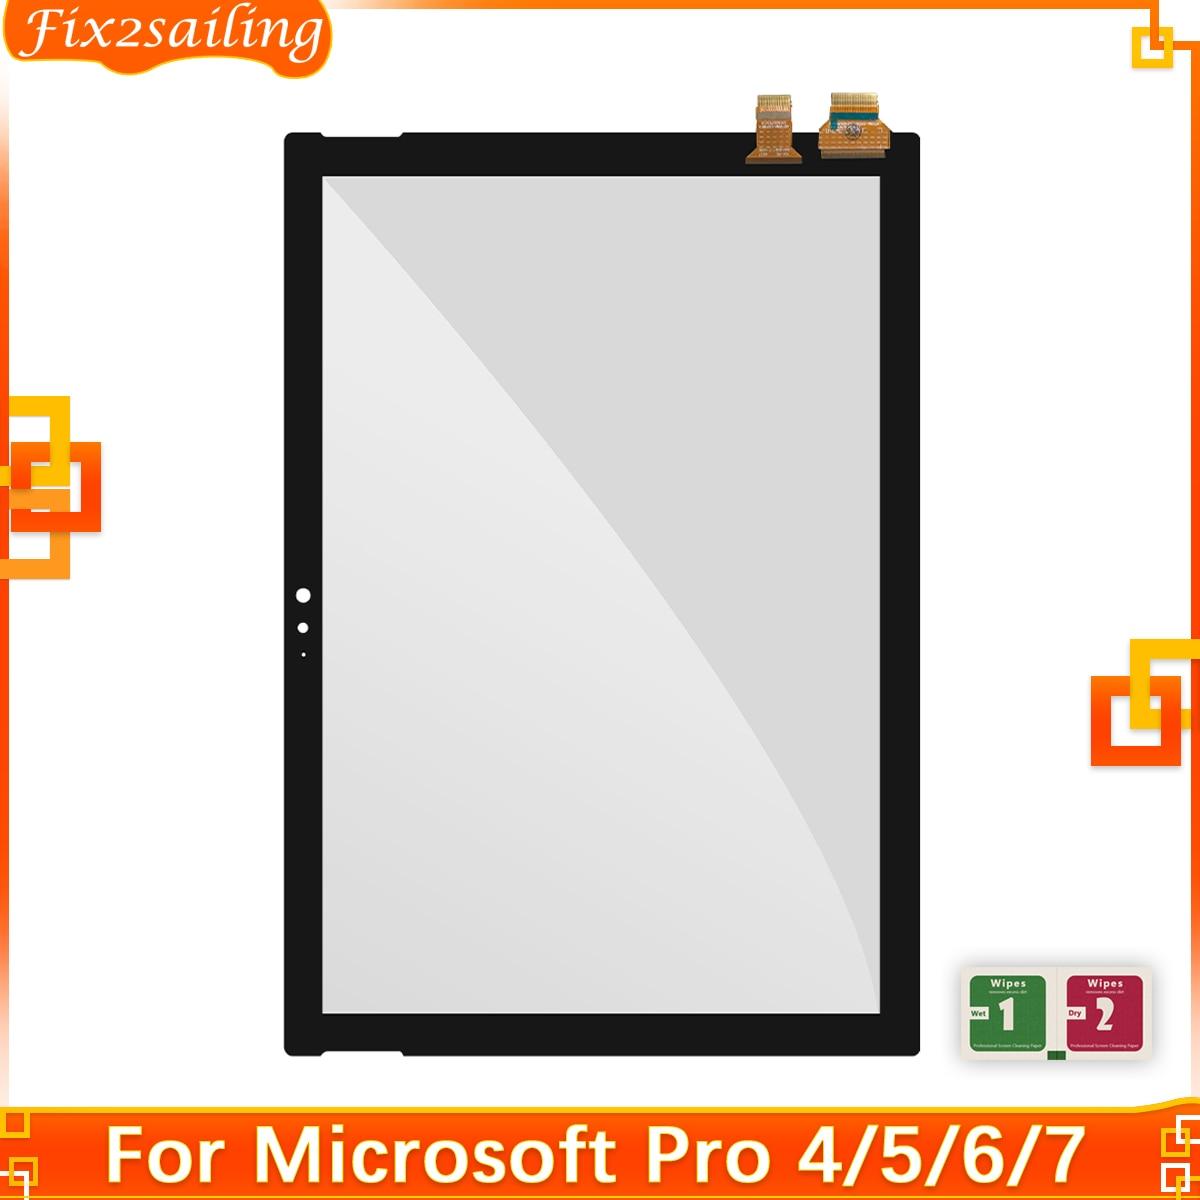 Дигитайзер сенсорного экрана для Microsoft Surface Pro 4 1724 Pro 4 Pro 5 Pro 6 Pro 7, стекло, Замена сенсорного экрана 100% Протестировано